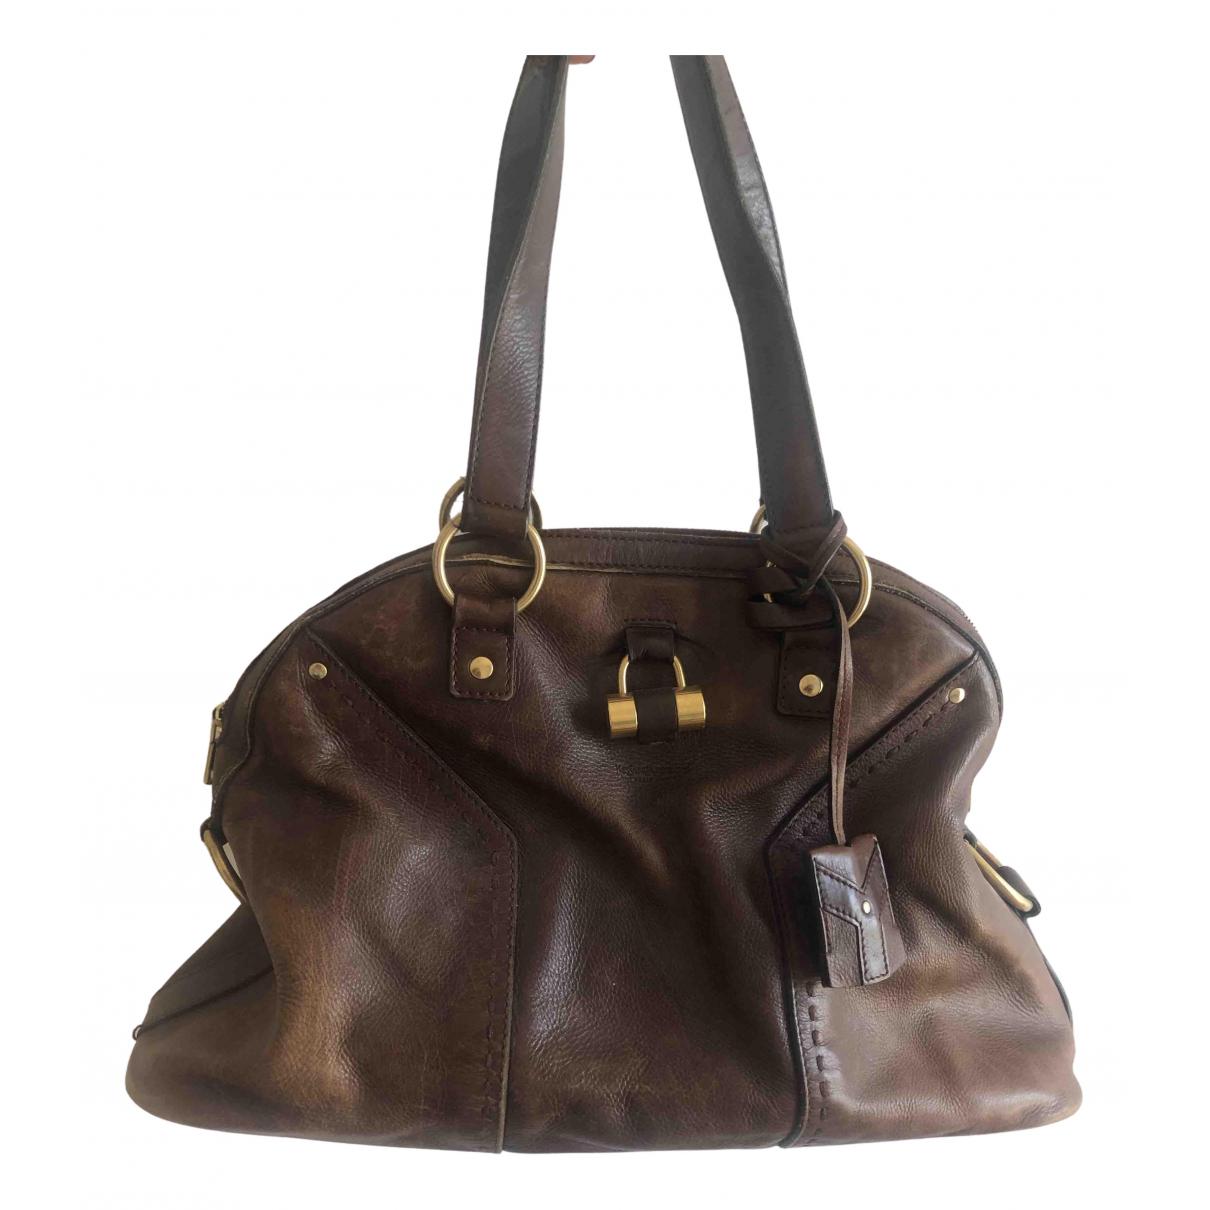 Yves Saint Laurent Muse Handtasche in  Braun Leder